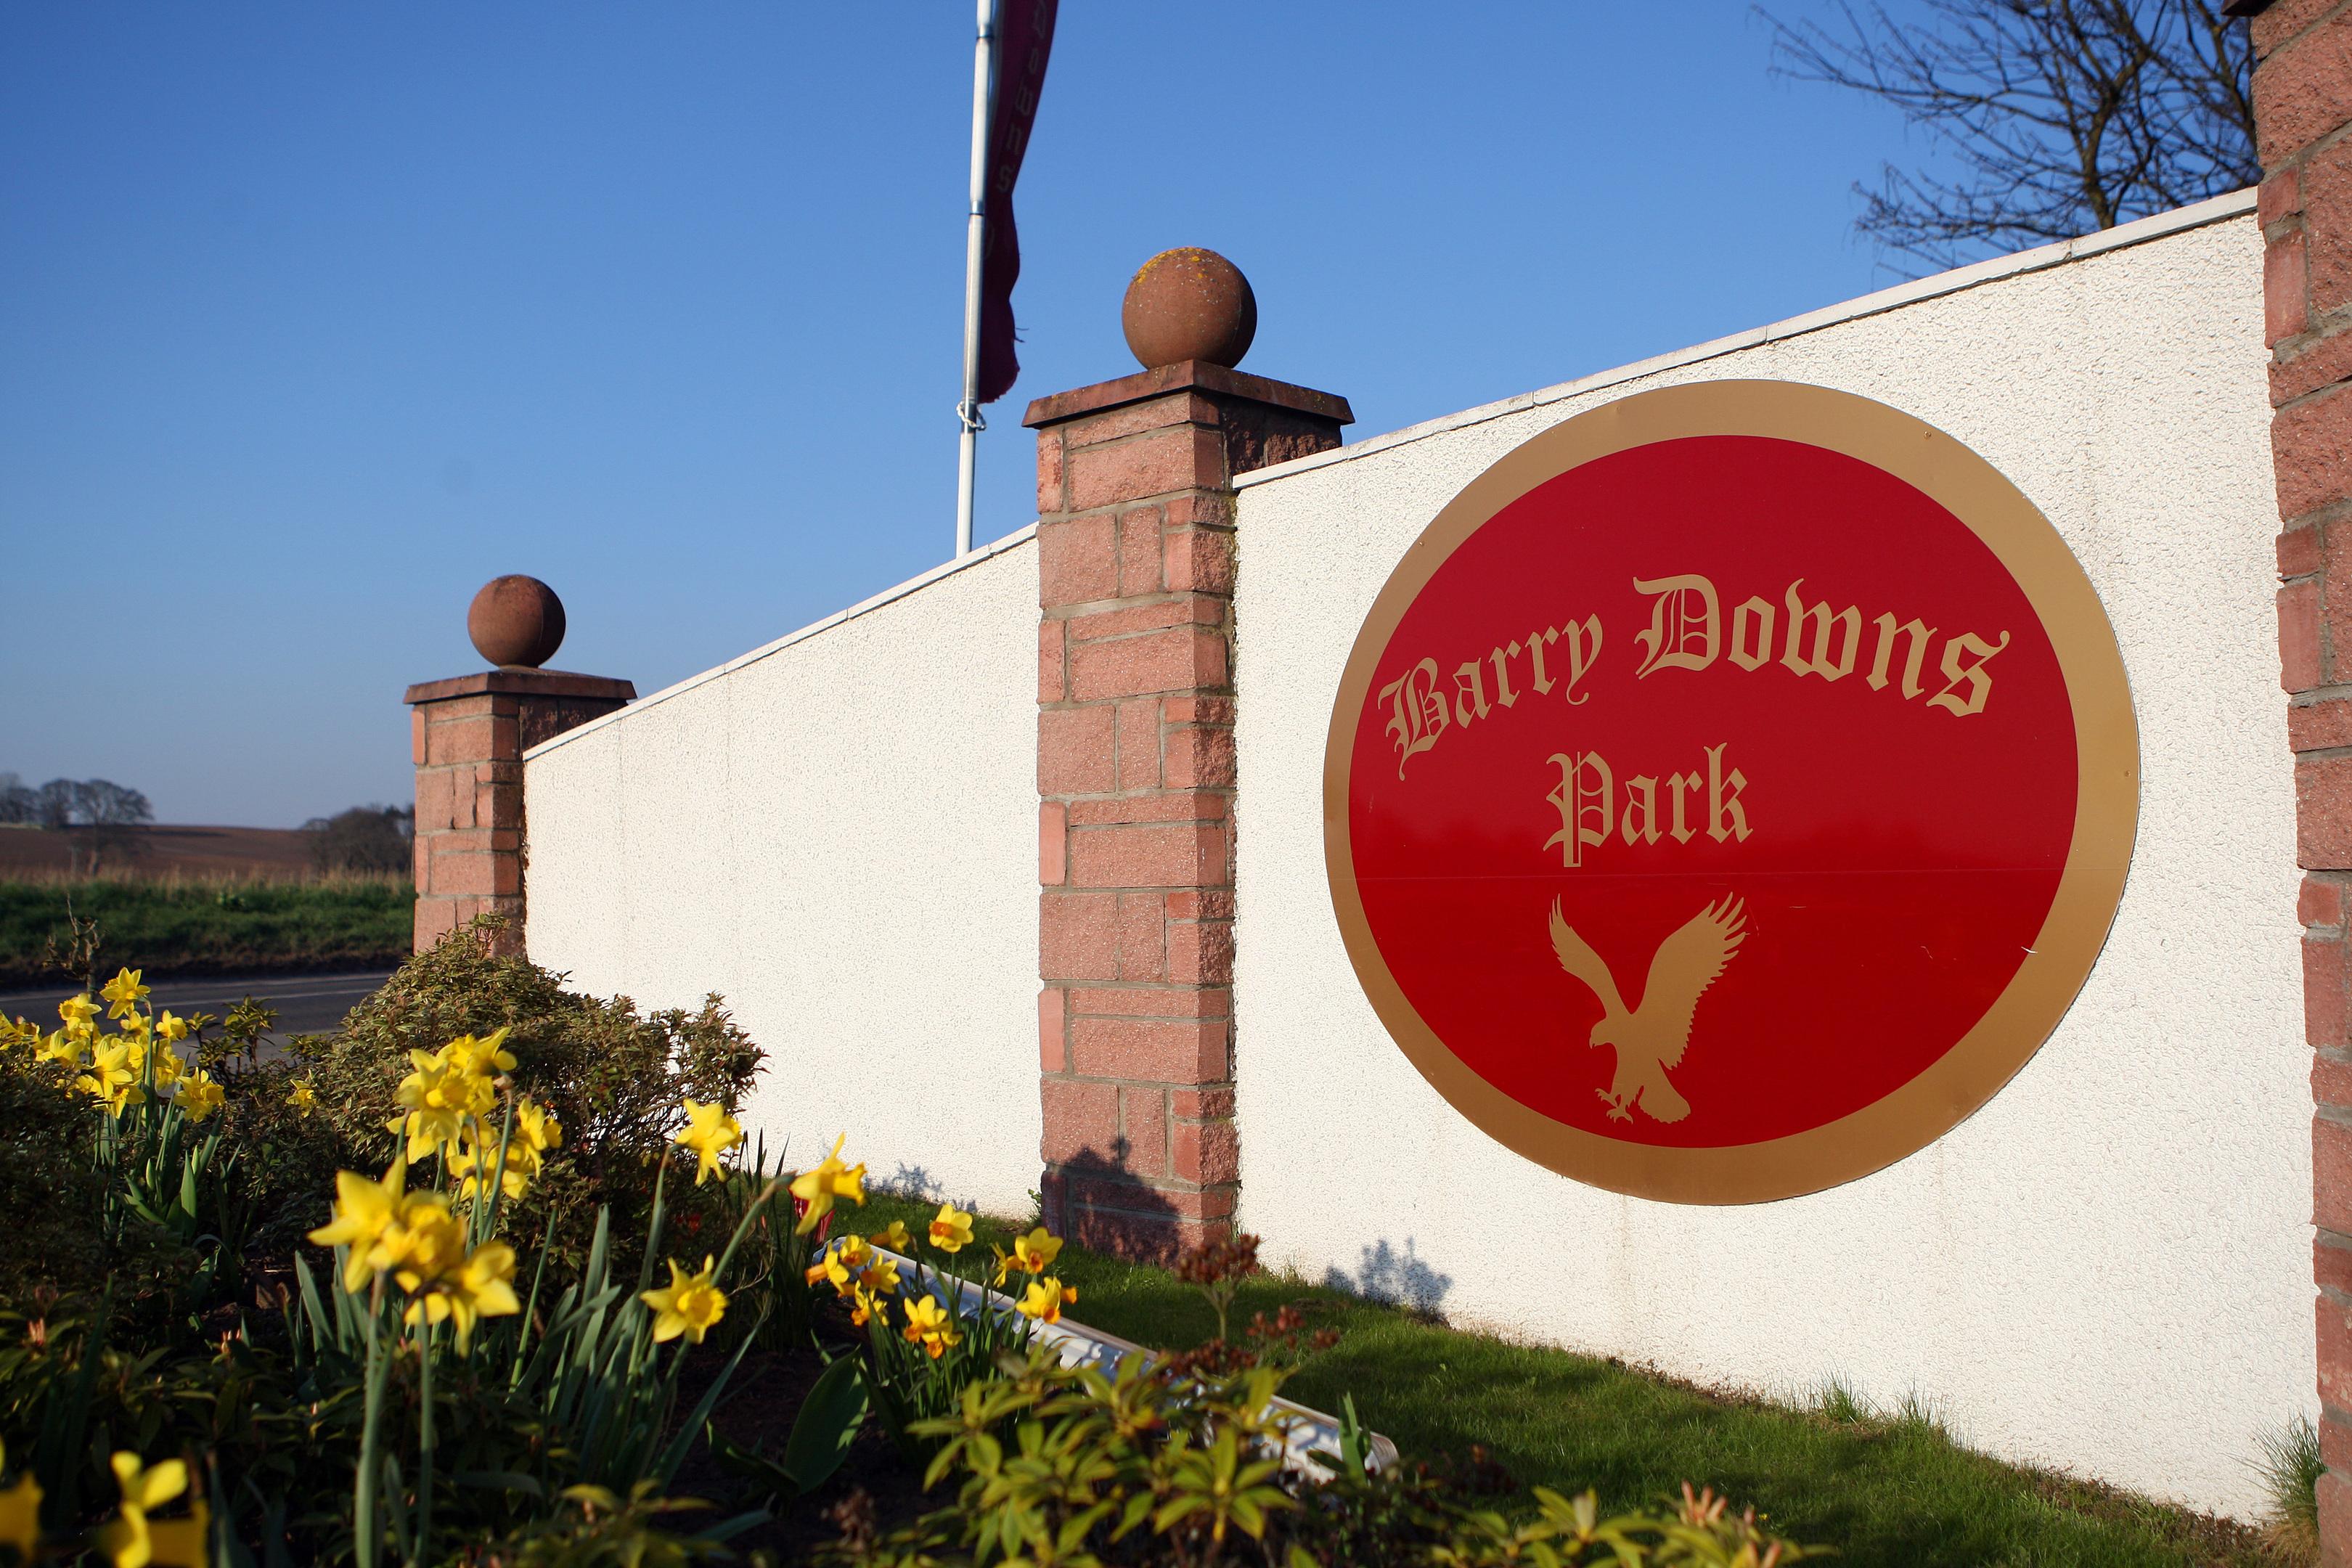 Barry Downs Park